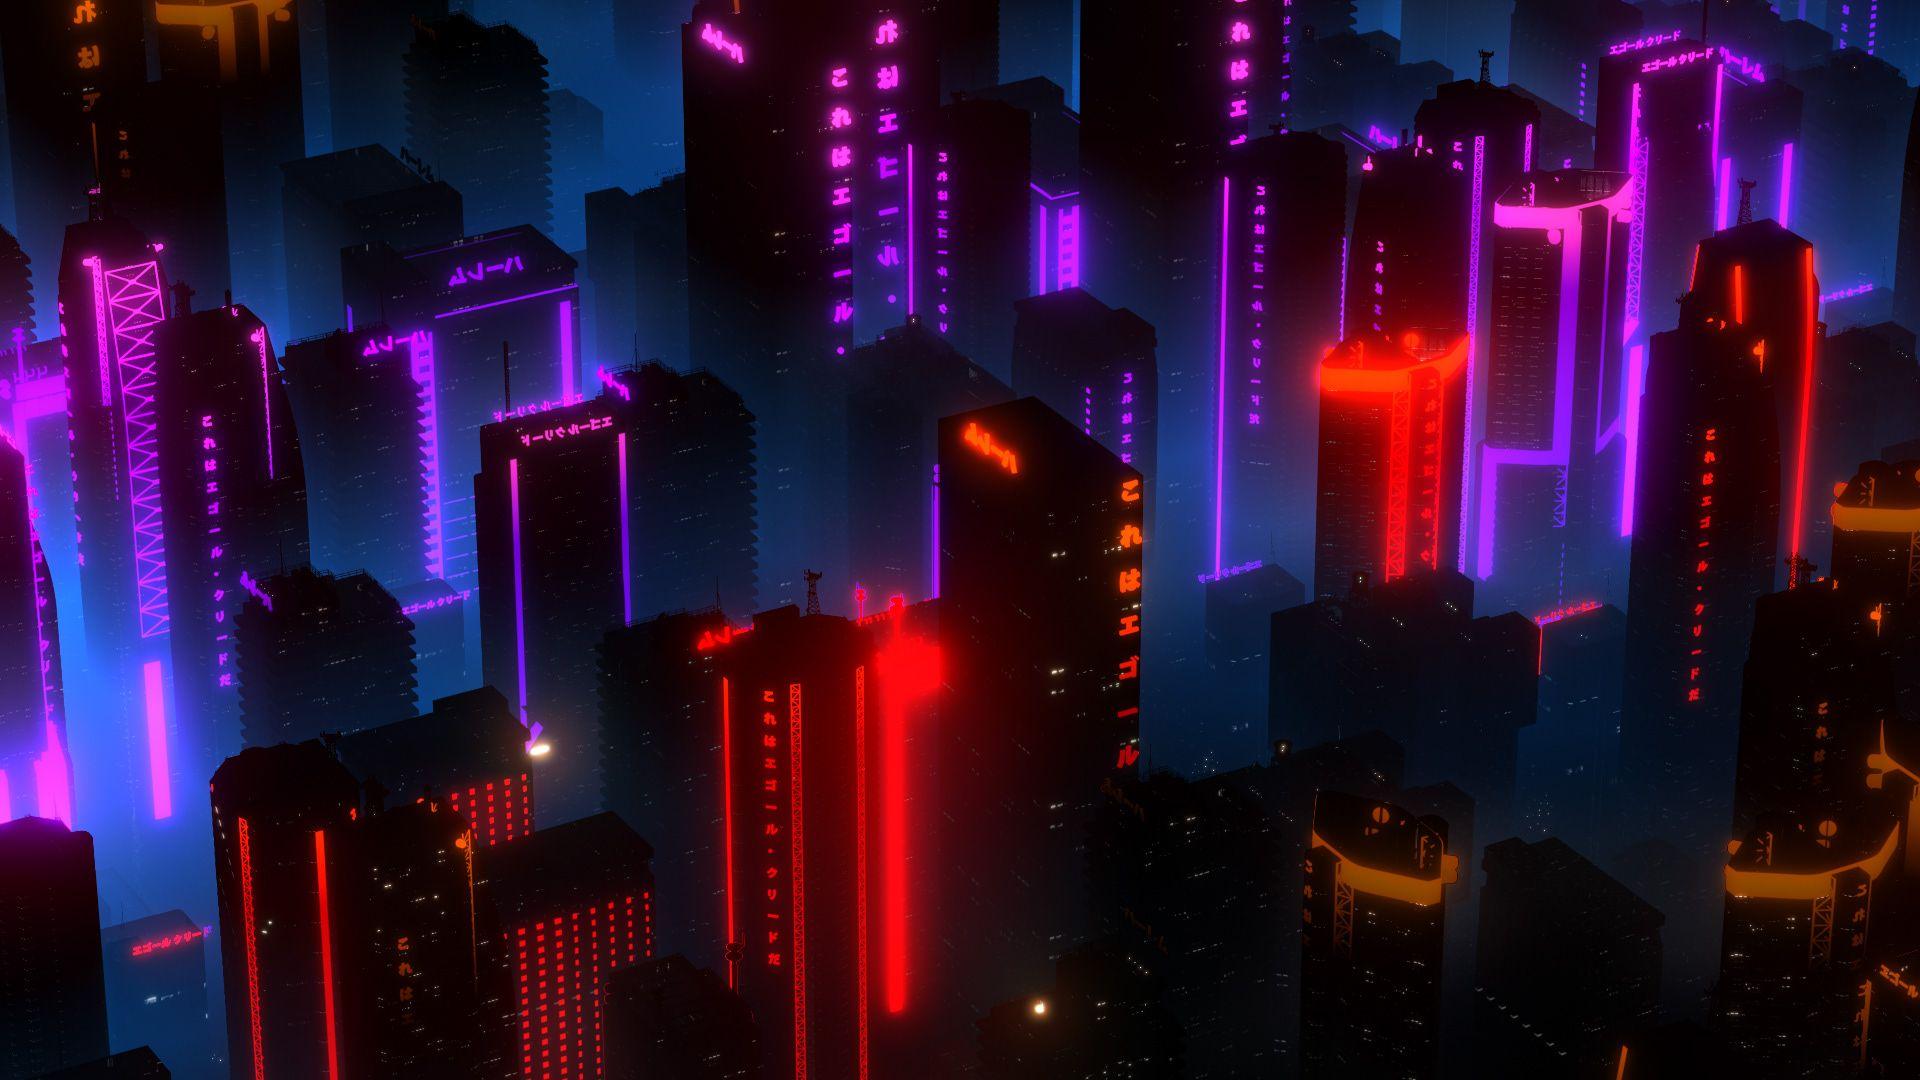 Neon Building 1920x1080 City Lights At Night Desktop Background Images Wallpaper